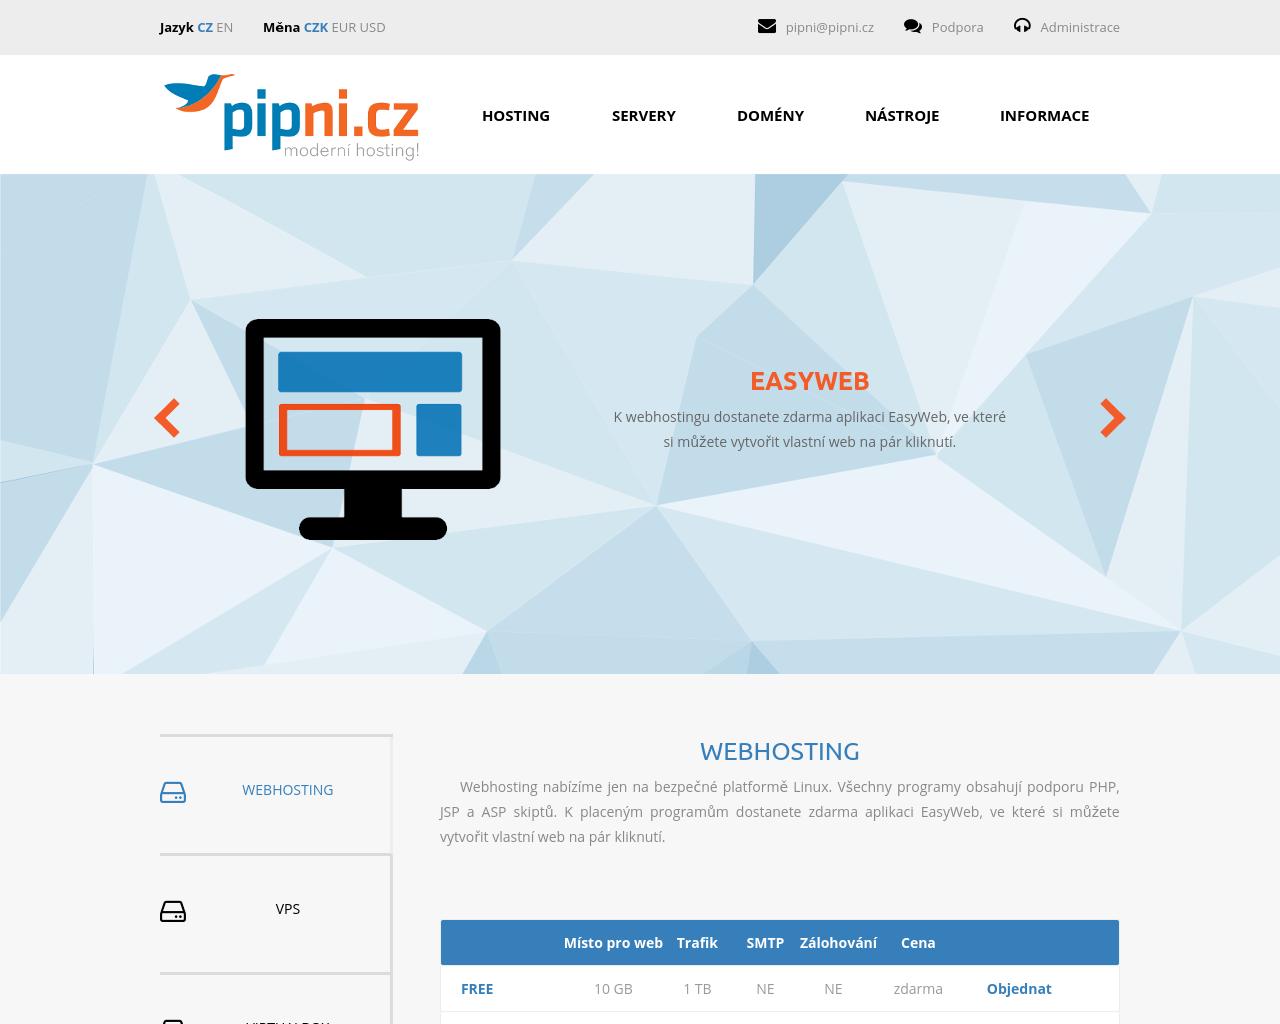 pipni.cz-Advertising-Reviews-Pricing